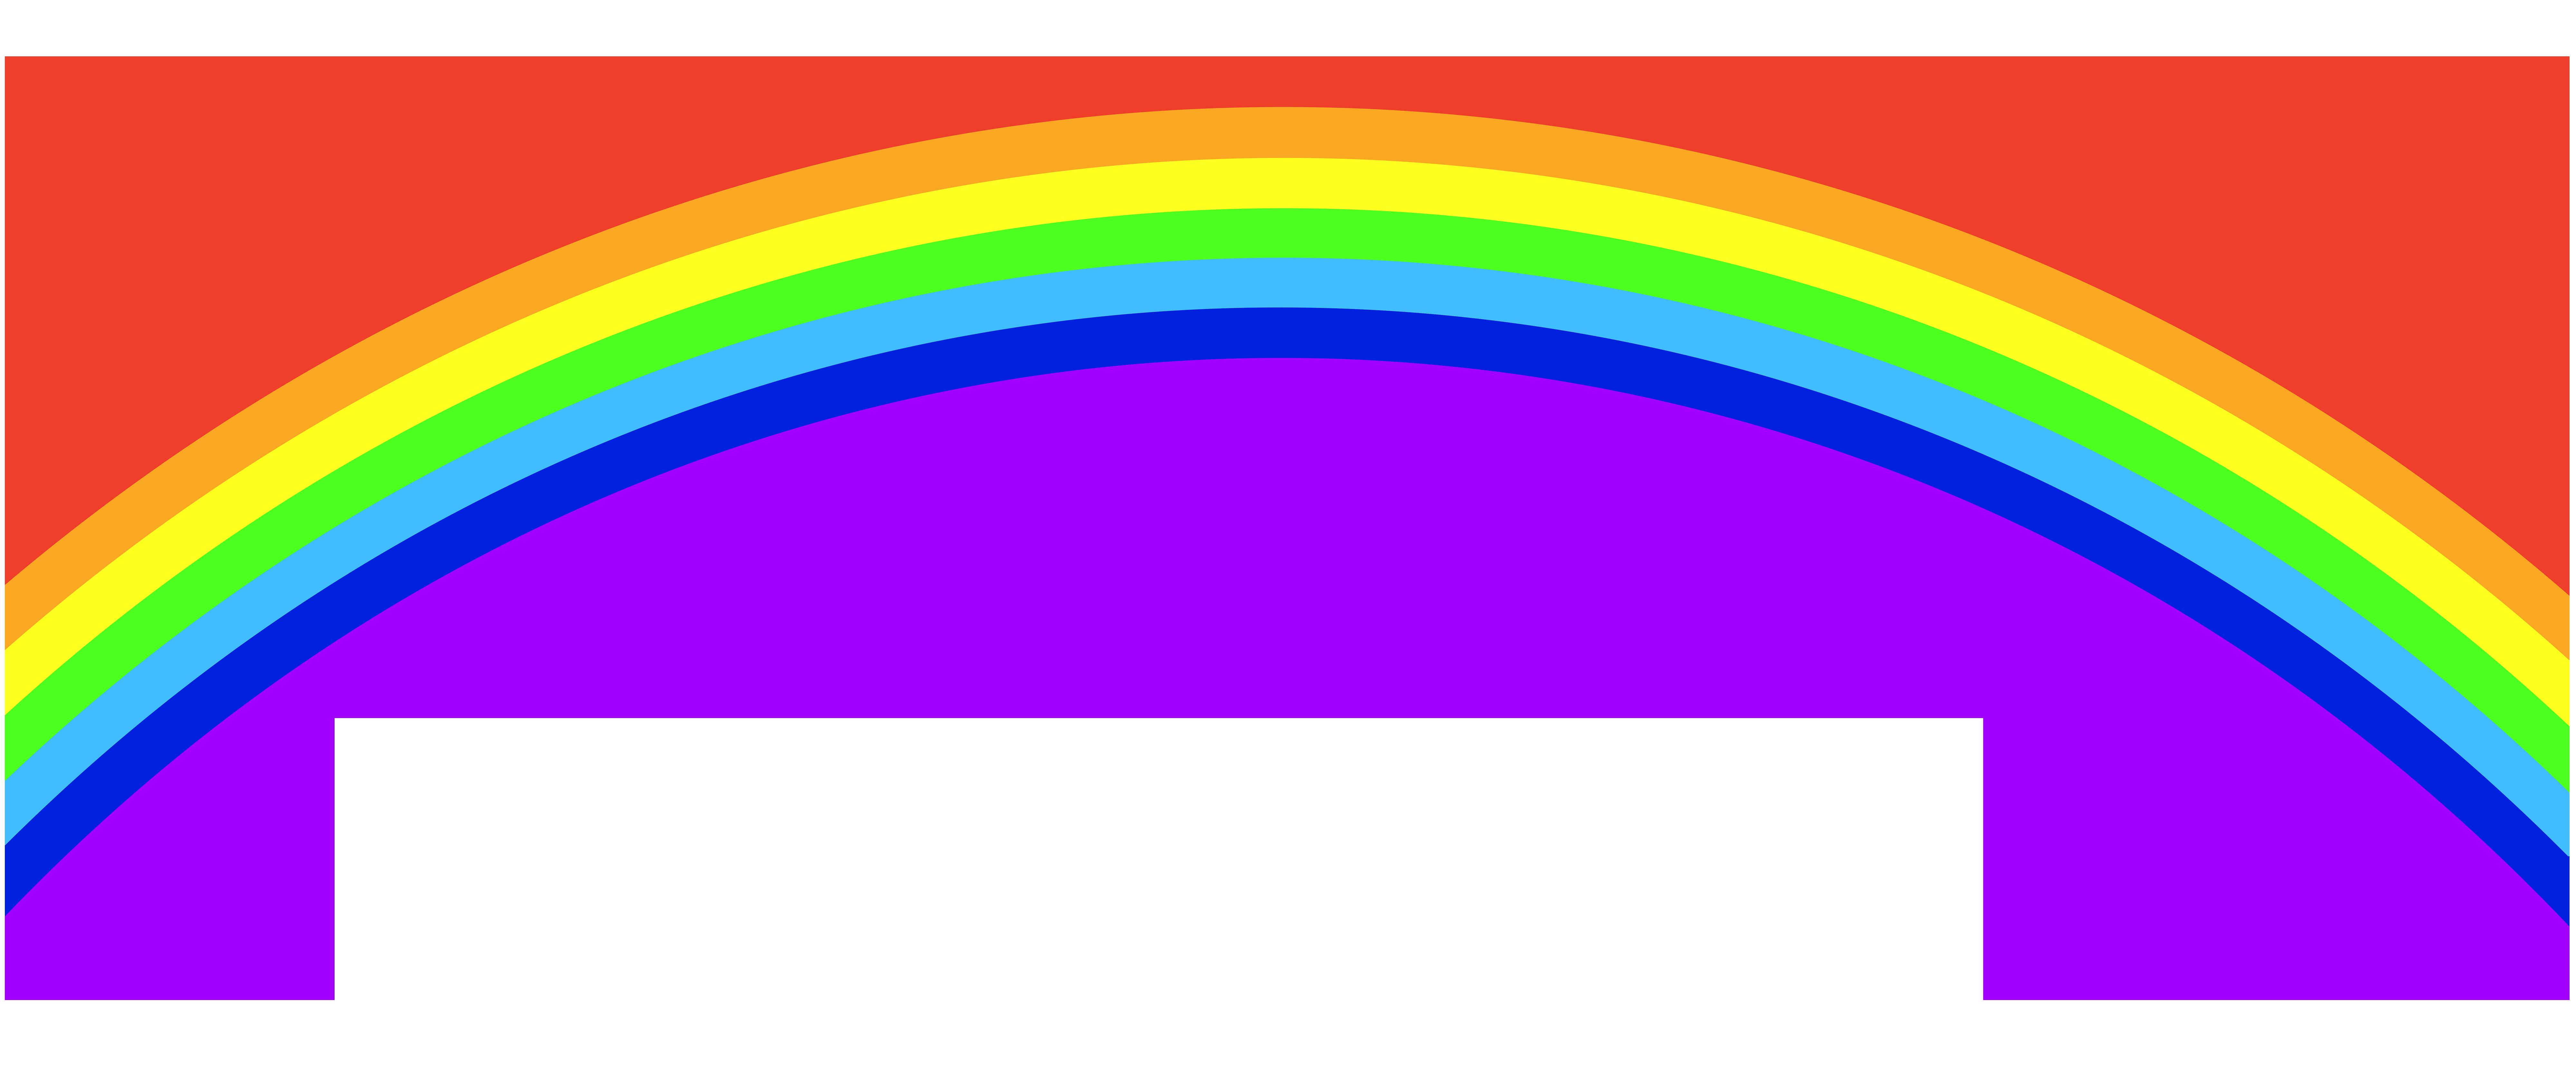 8000x3315 Rainbow clip art image